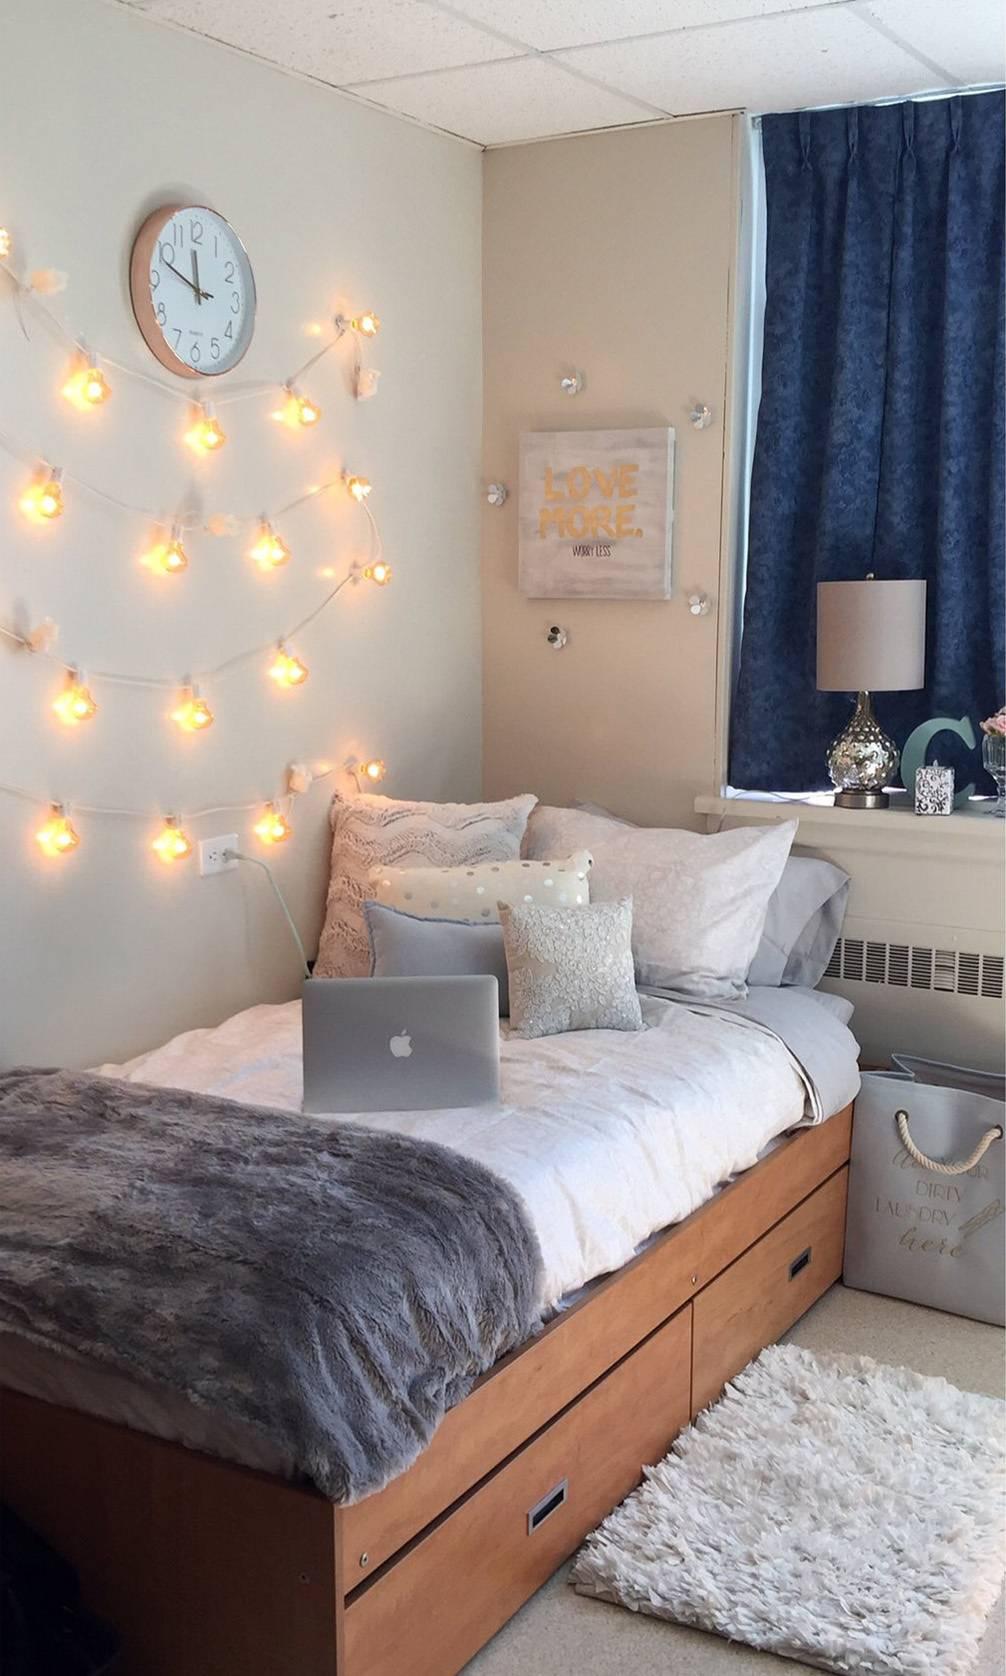 Dorm Room Decor Ideas: After